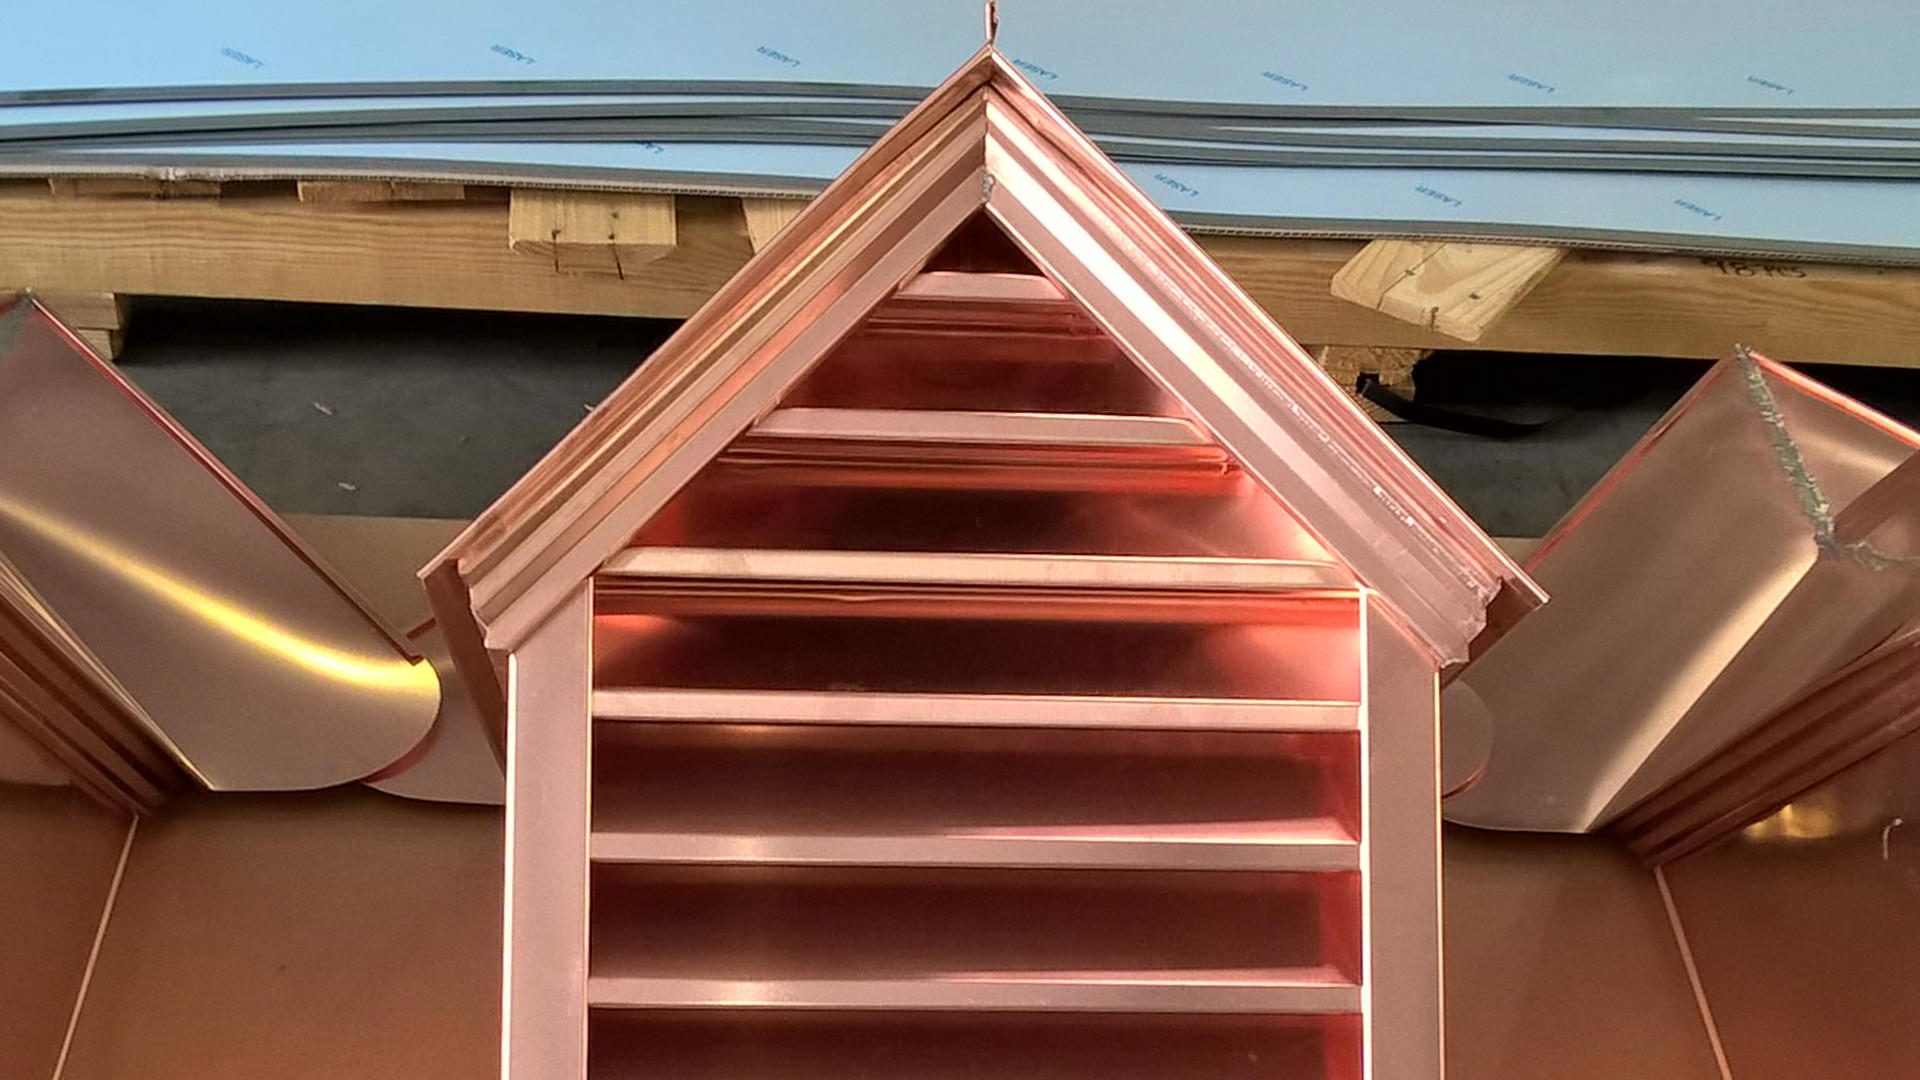 Custom made copper gable dormers